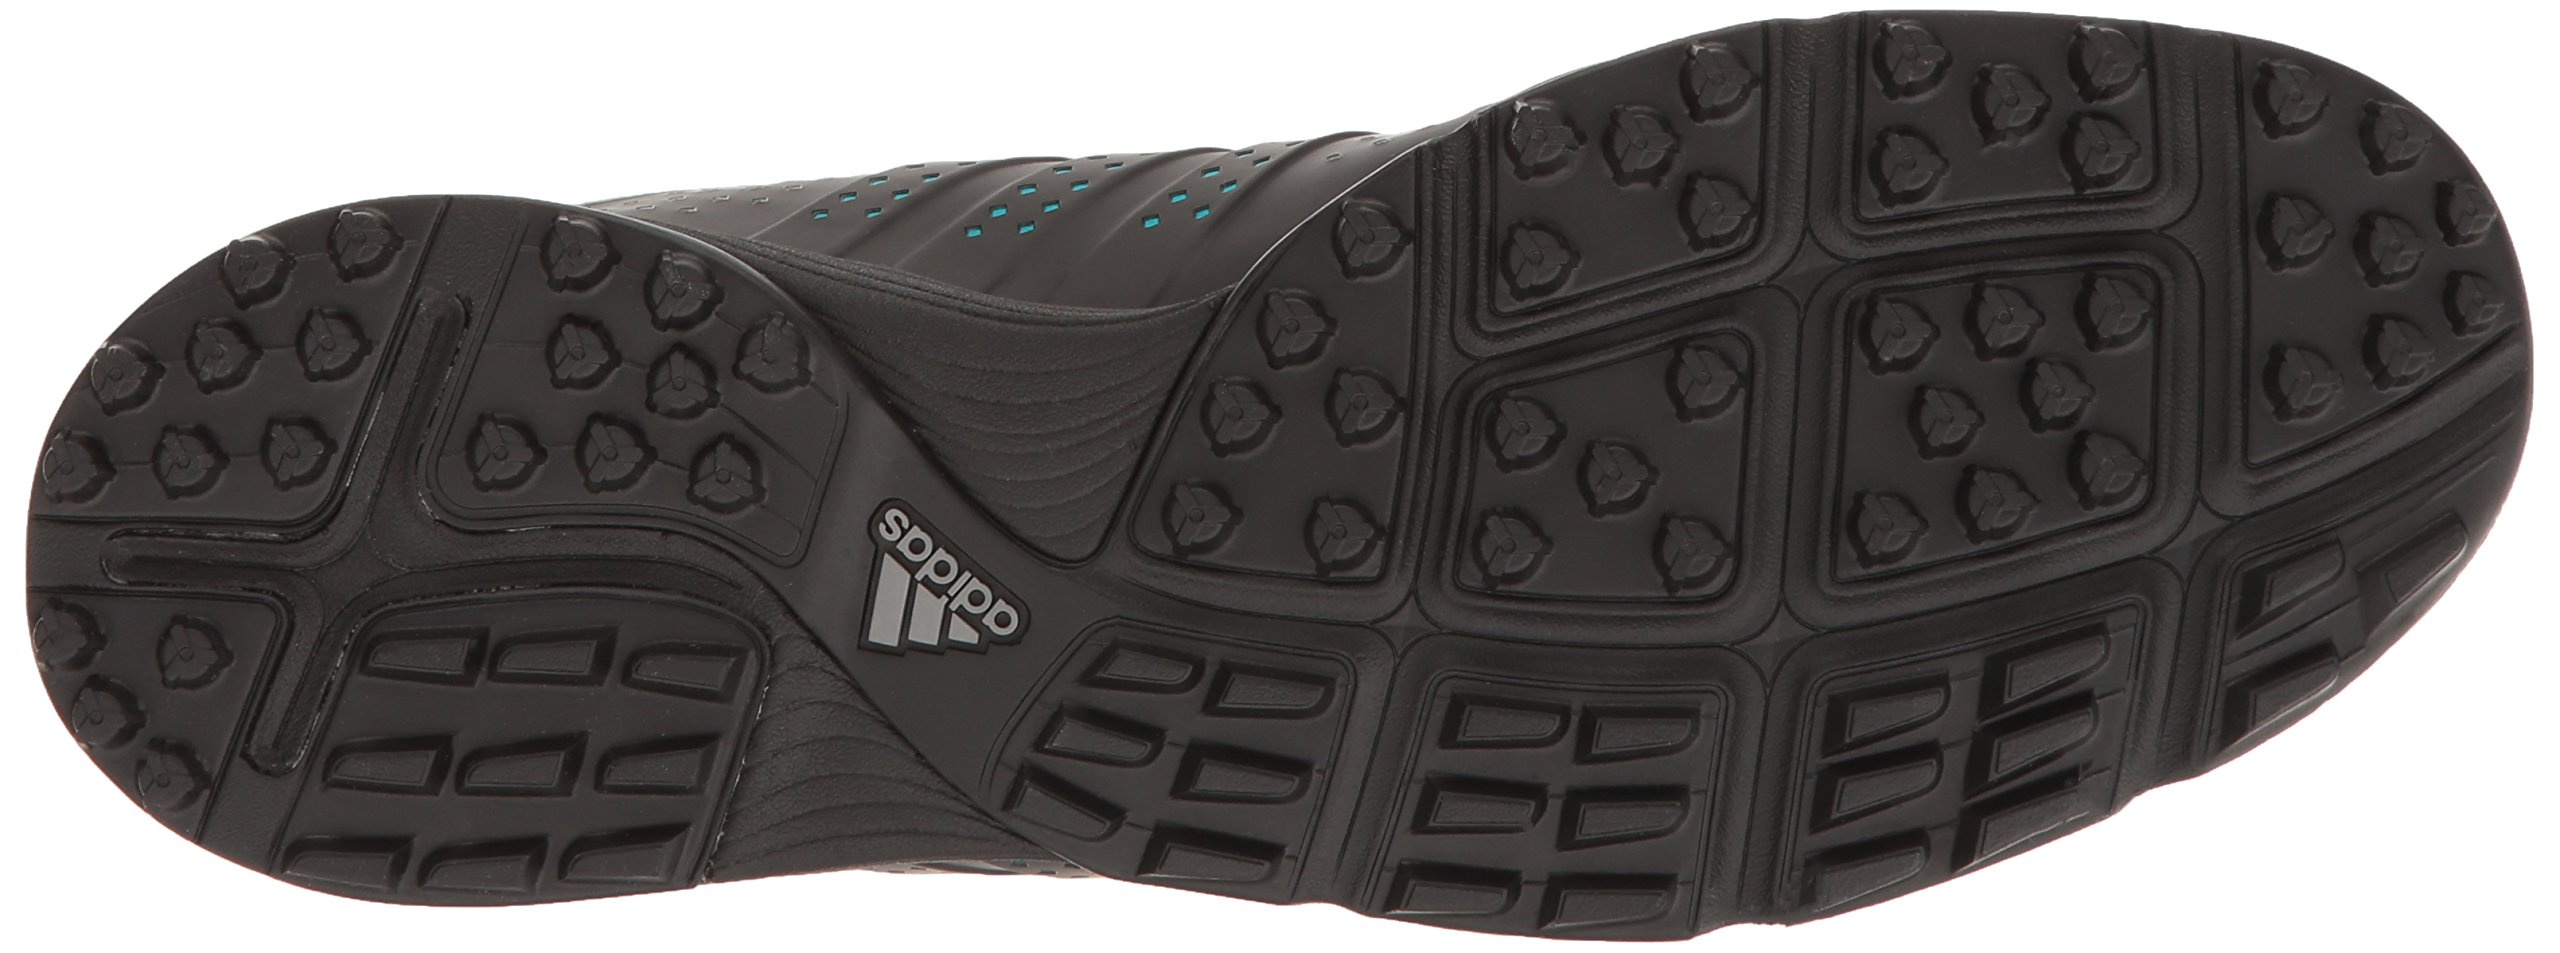 adidas Women's Adipure Sport Golf Shoe, Grey, 7 M US by adidas (Image #3)